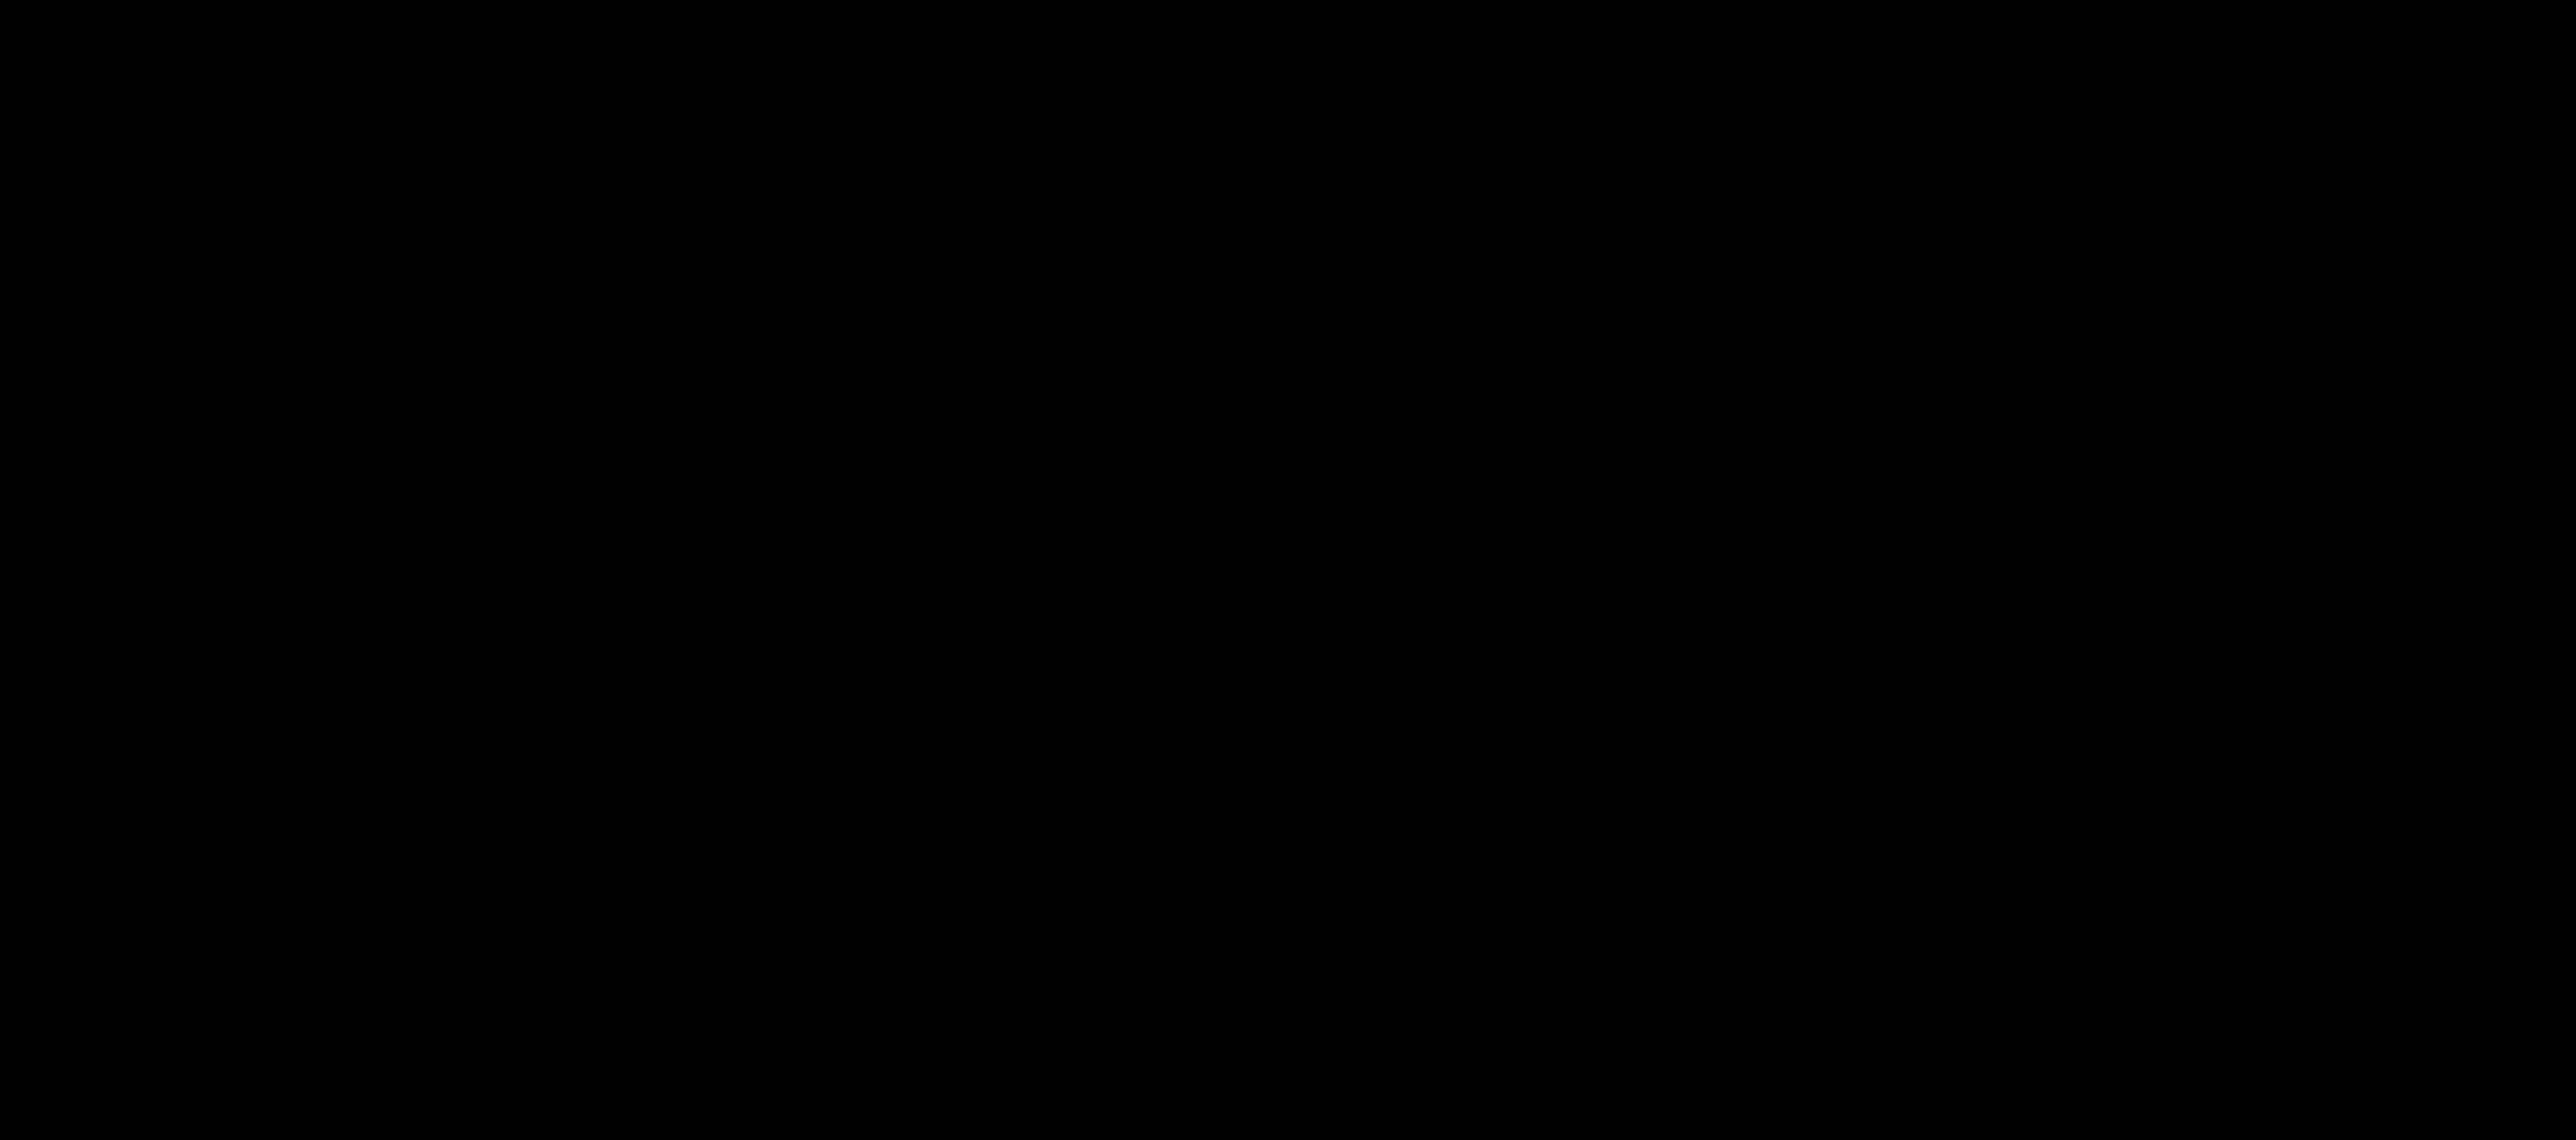 SF 1126 (Zwitterionic Salt Form)